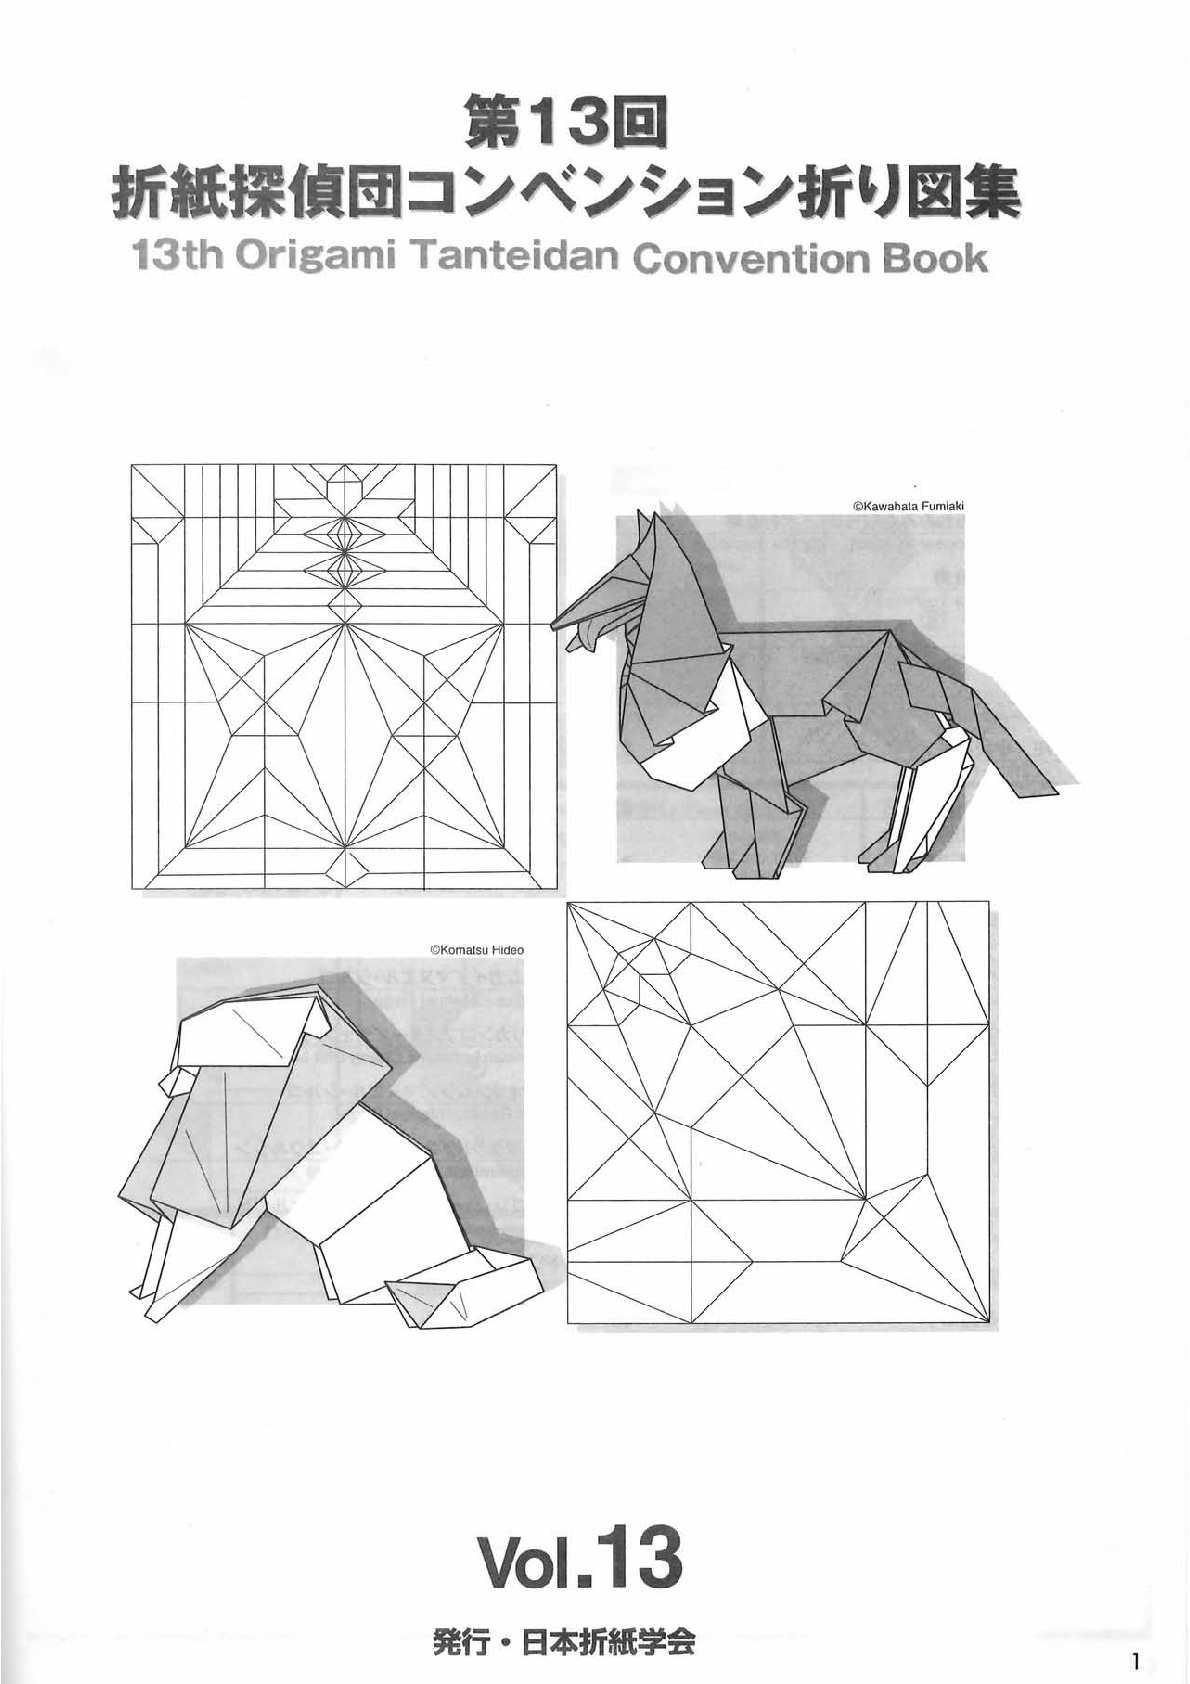 pdf vol.18 origami tanteidan convention book